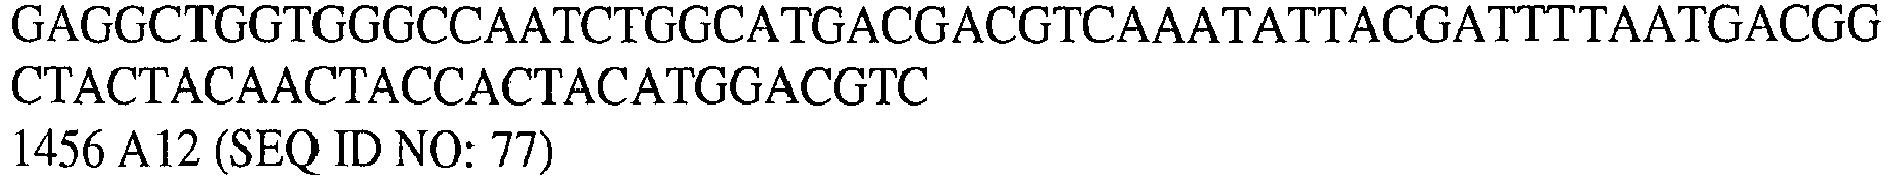 Figure imgb0442